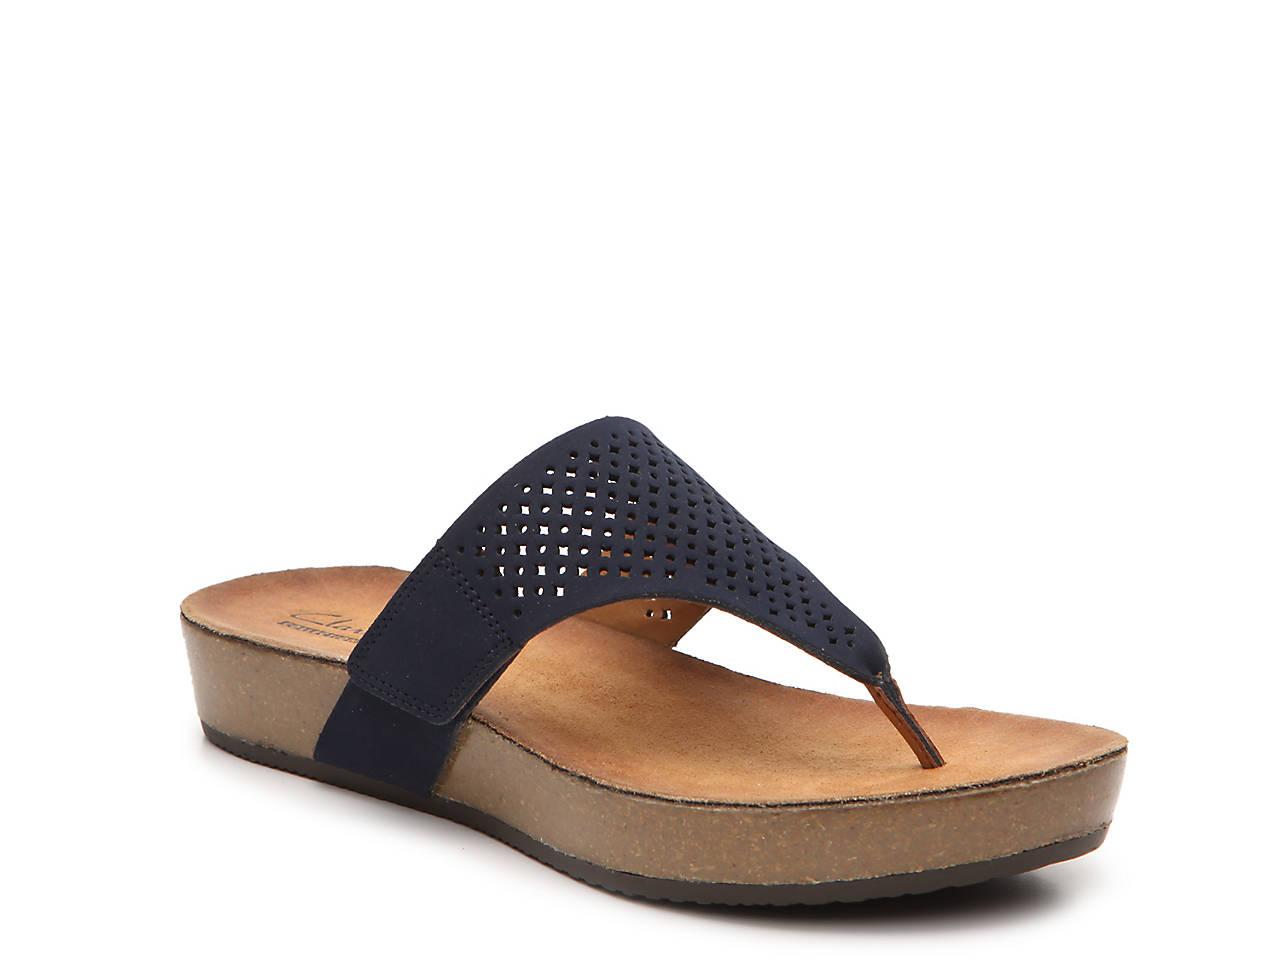 ed06f2486fe0 Clarks Aeron Logan Wedge Sandal Women s Shoes